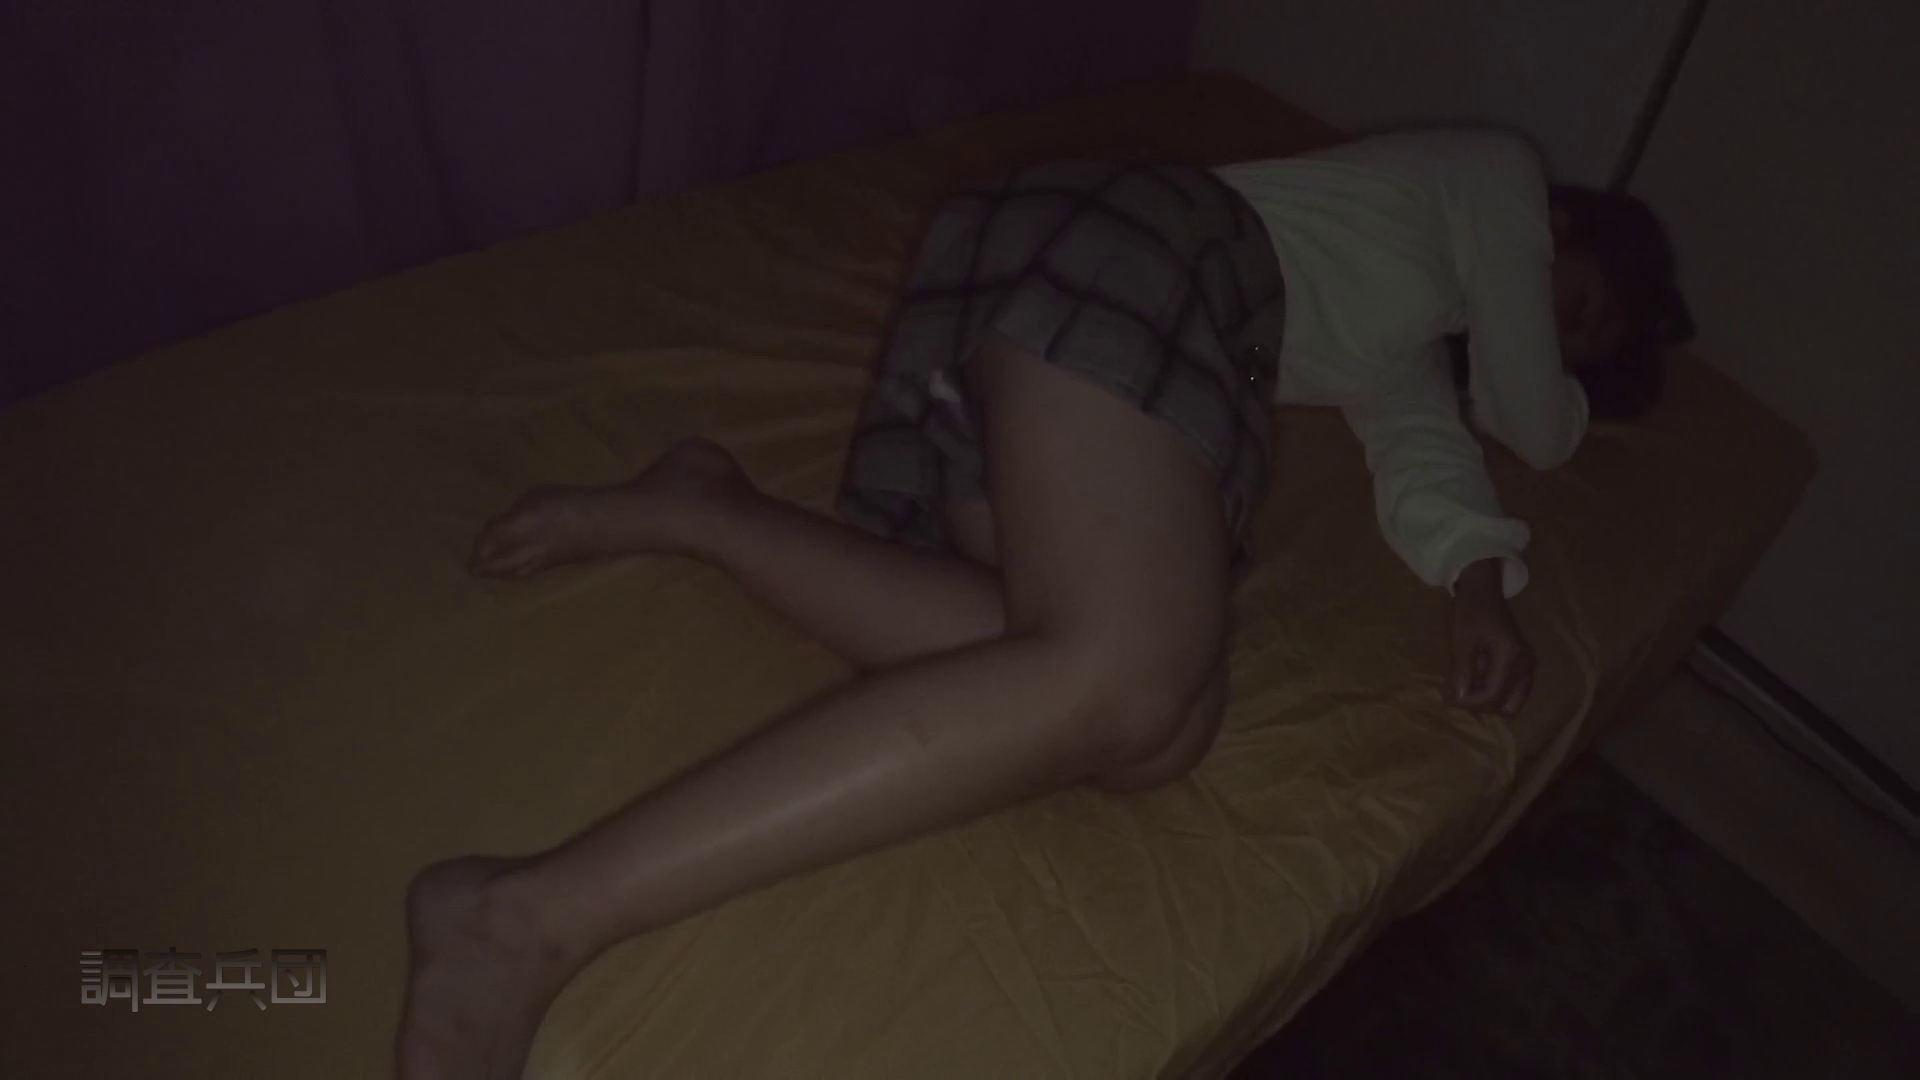 RE:~反撃の悪戯~vol.01 美肌 エロ画像 99枚 4